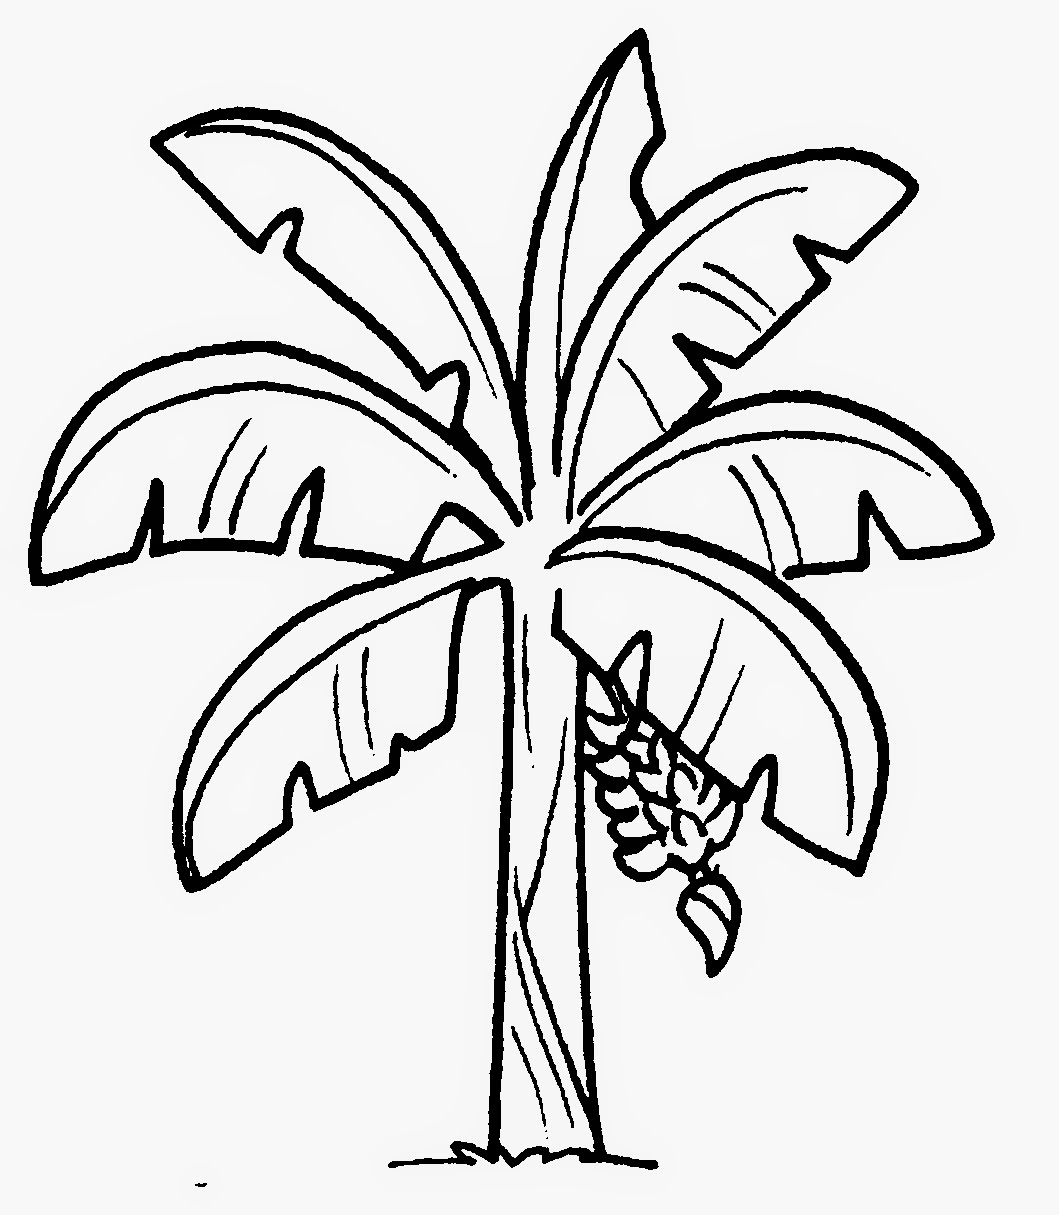 Dunia Sekolah Gambar Hitam Putih Drawing Bunga & Pokok